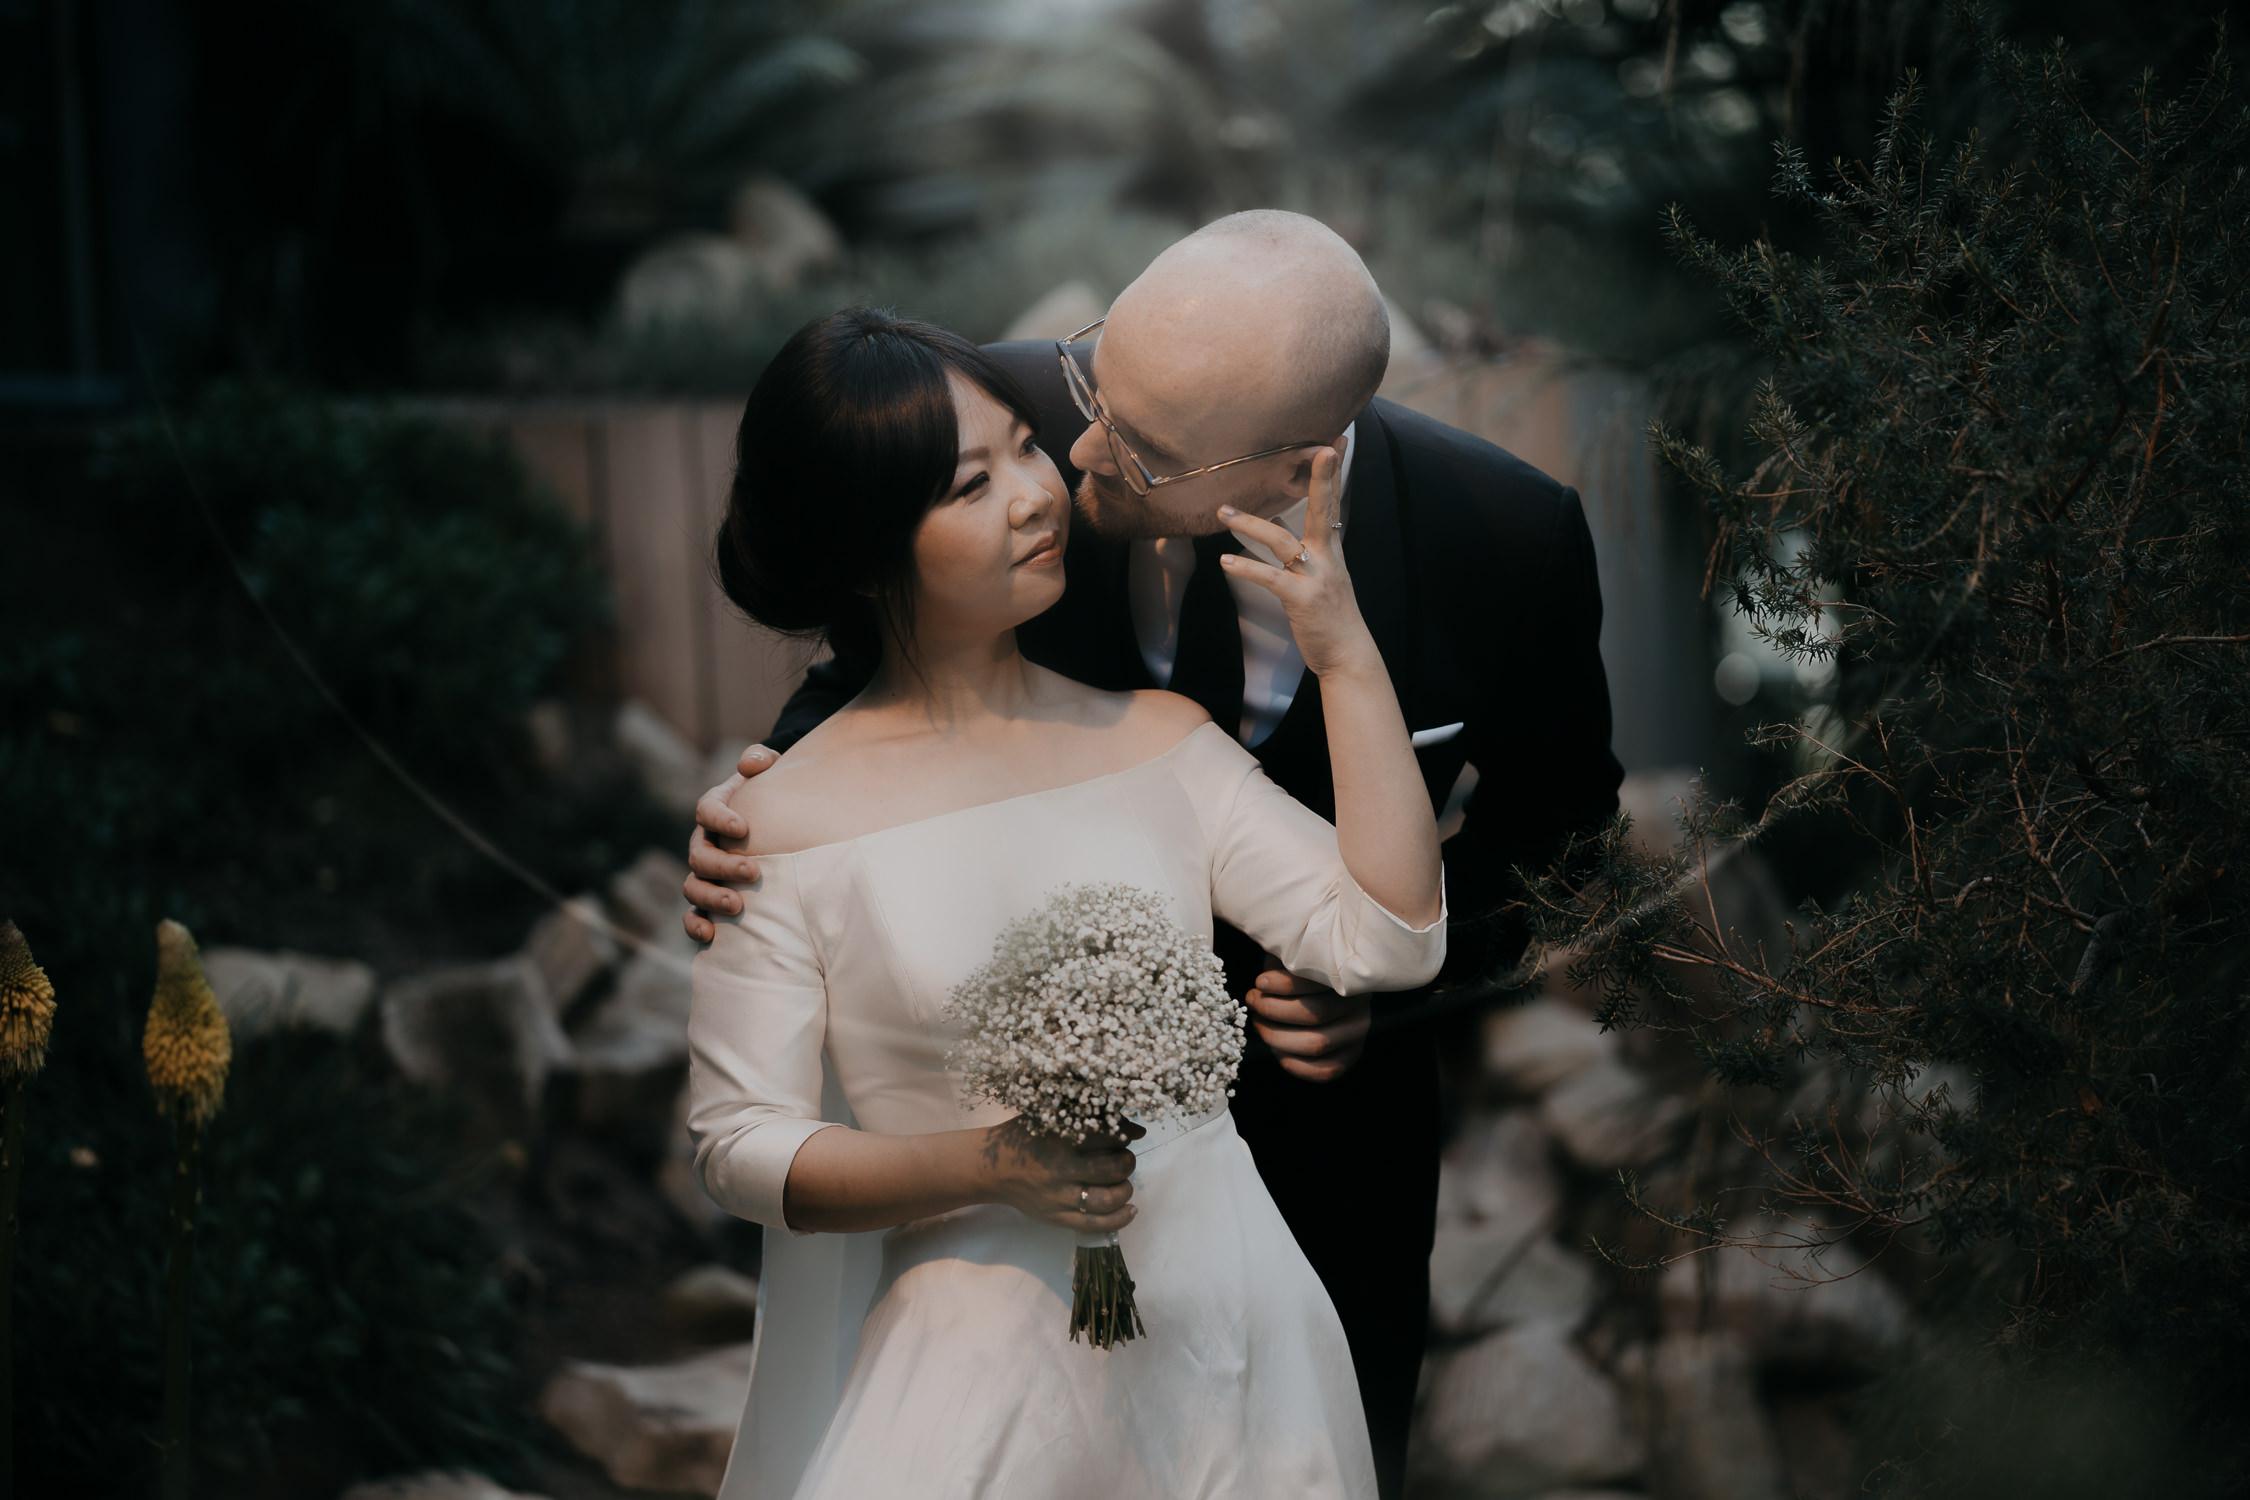 bruidsfotograaf amsterdam hortus botanicus huwelijk